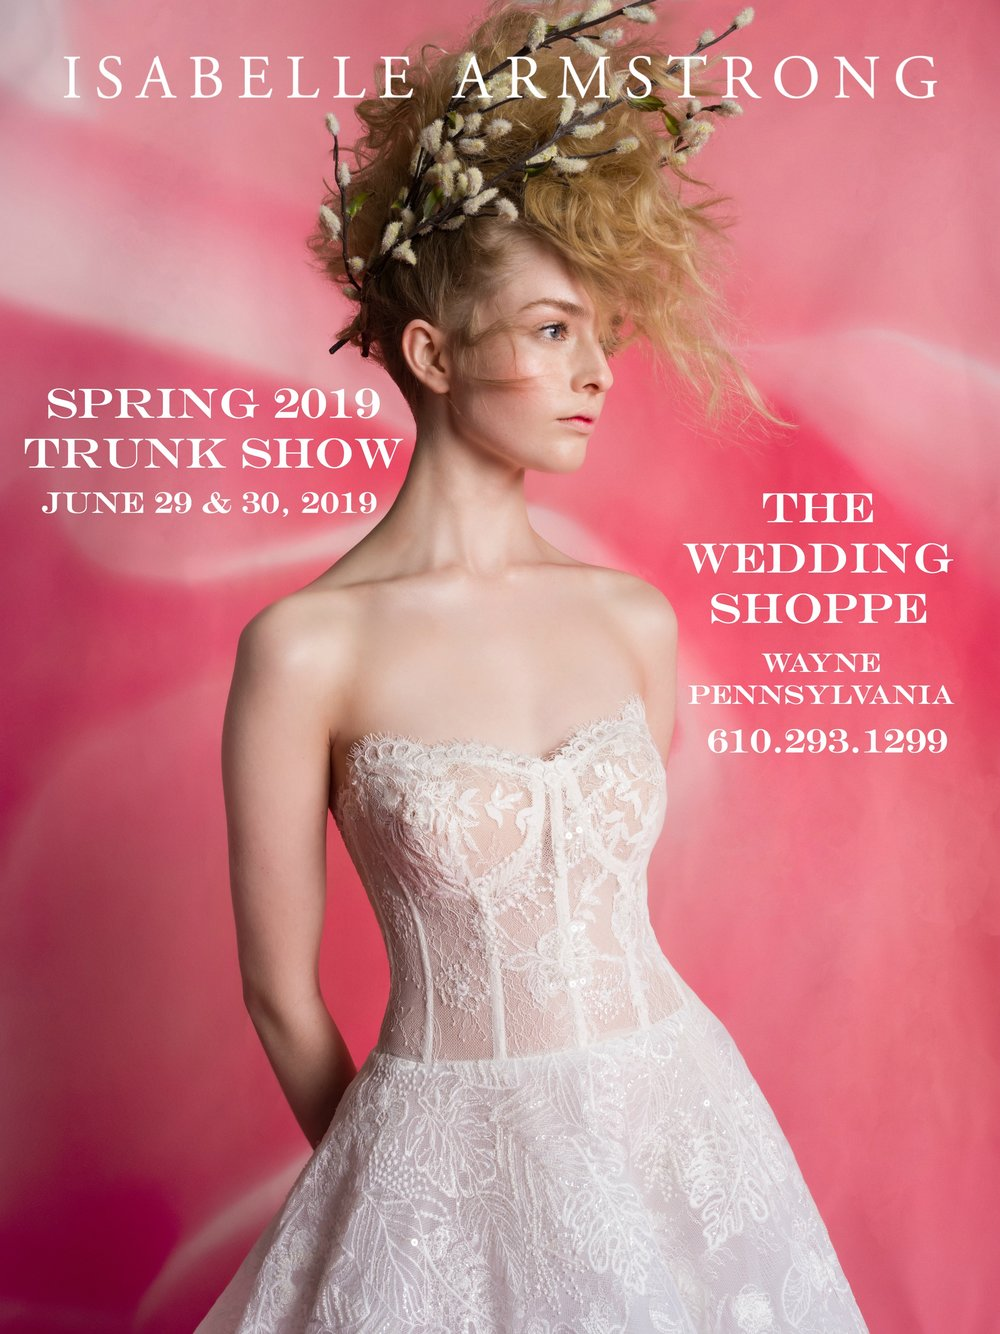 IA TS - WEDDING SHOPPE 6-29-18.jpg